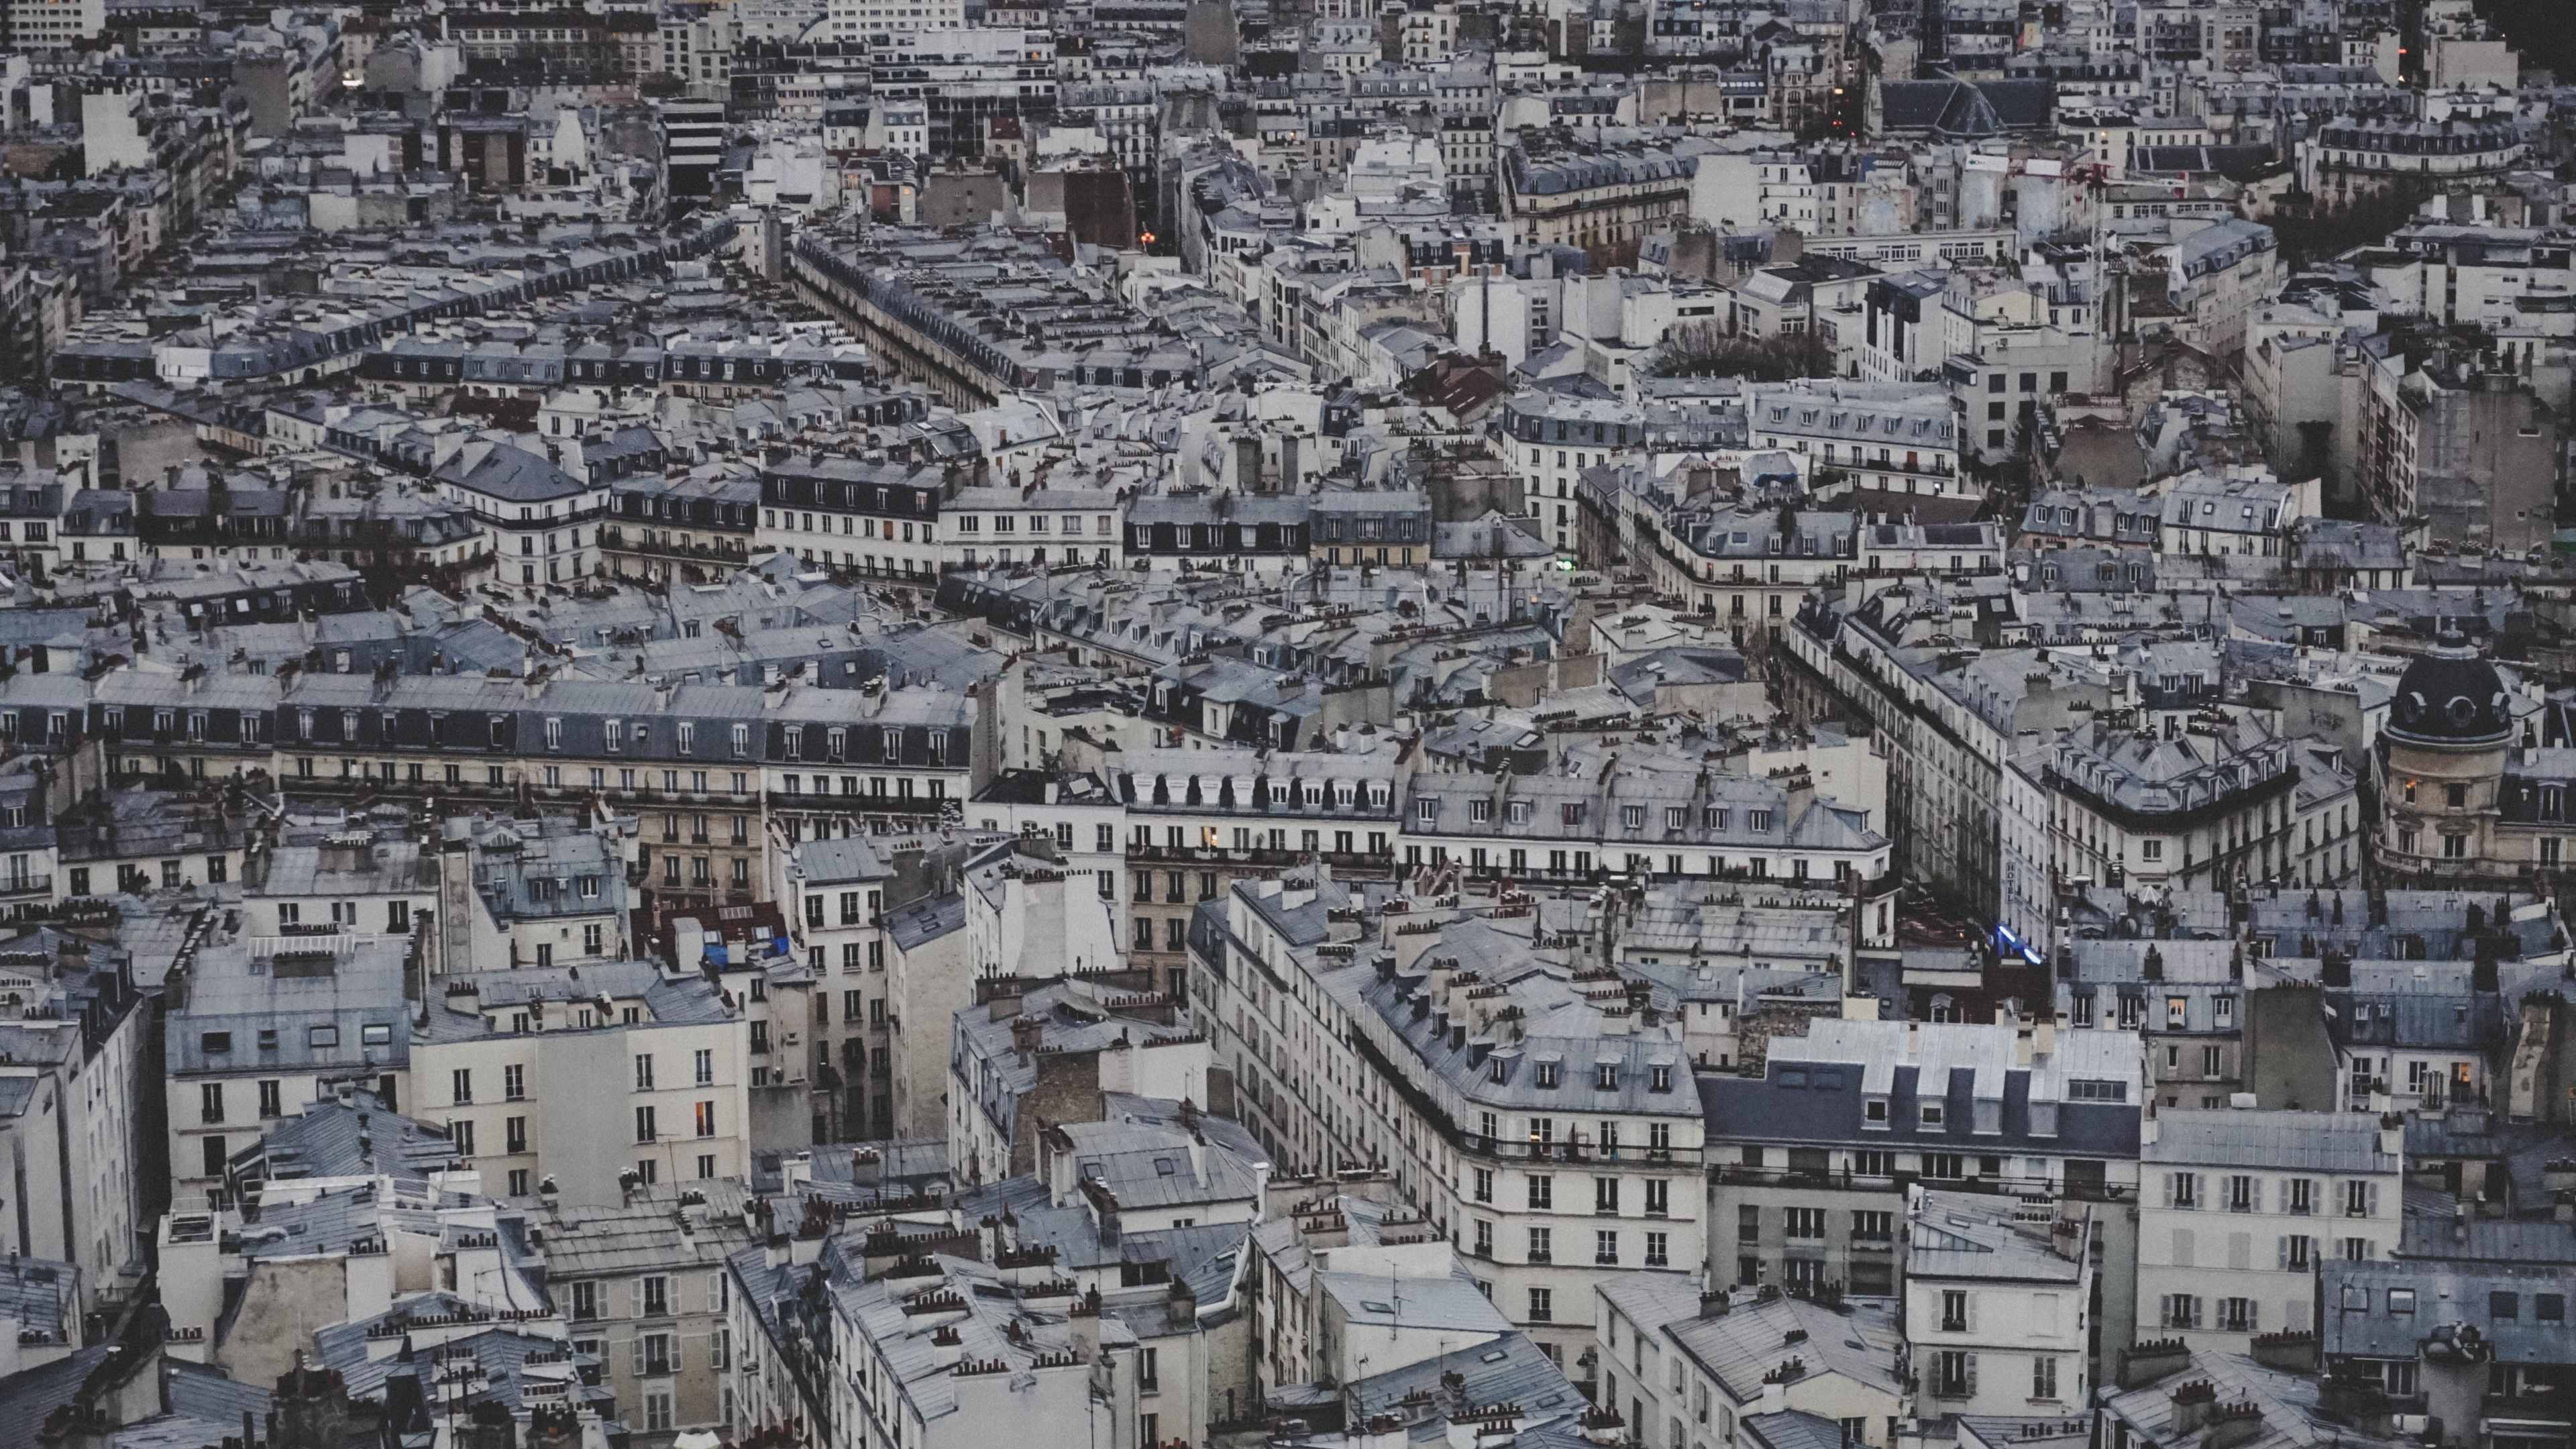 infrastructure buildings top view 4k 1538066465 - infrastructure, buildings, top view 4k - top view, infrastructure, buildings